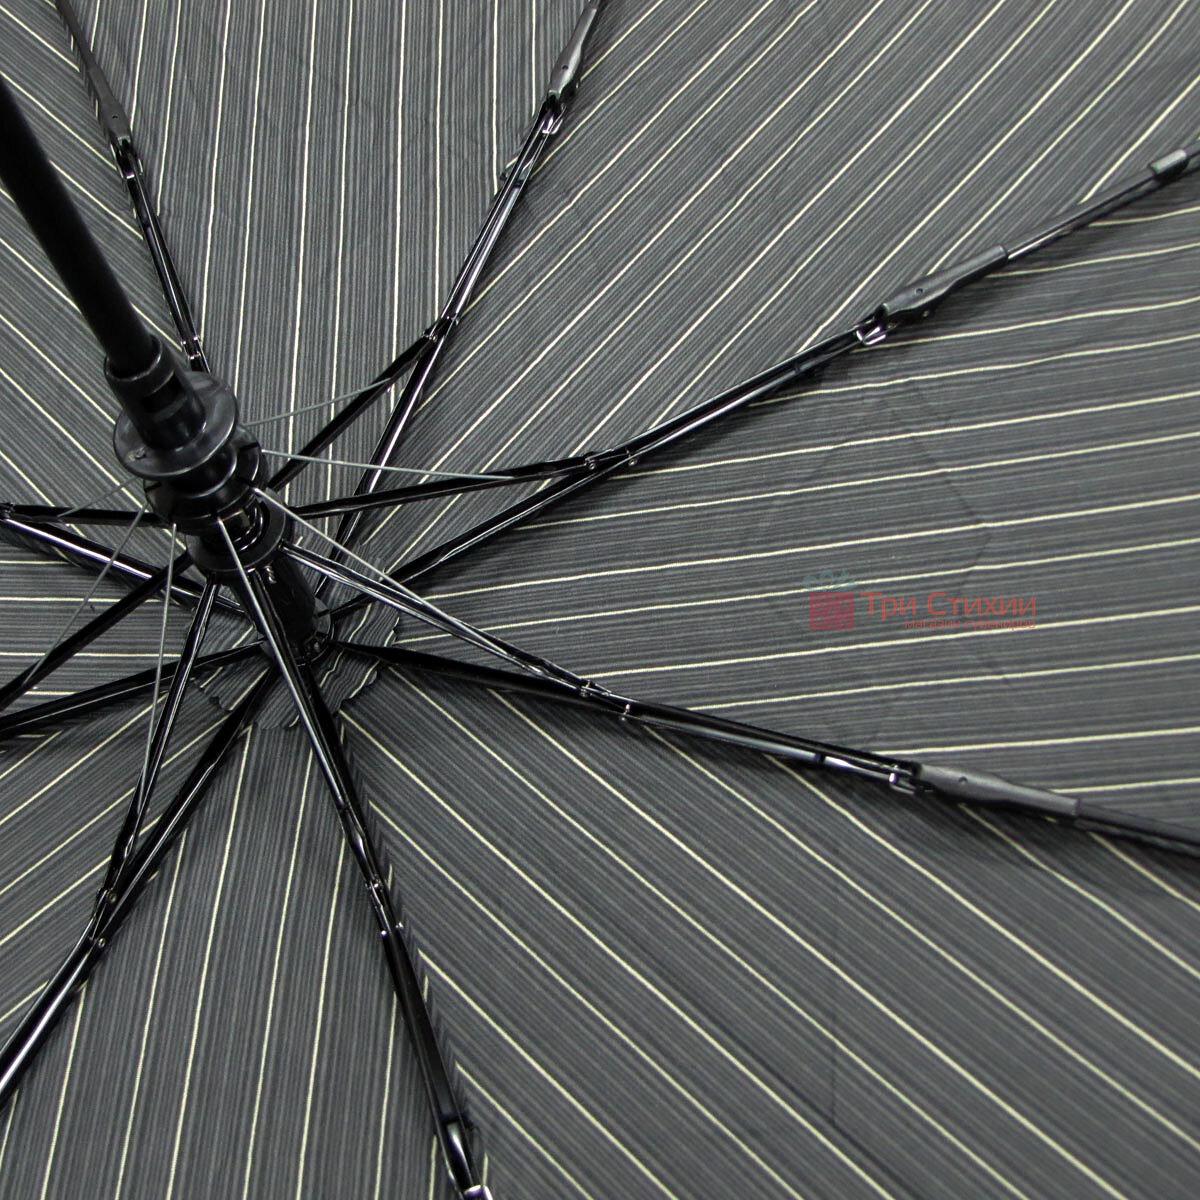 Парасоля складана Doppler Carbon 730167-4 напівавтомат Сіра в дрібну смужку, фото 4